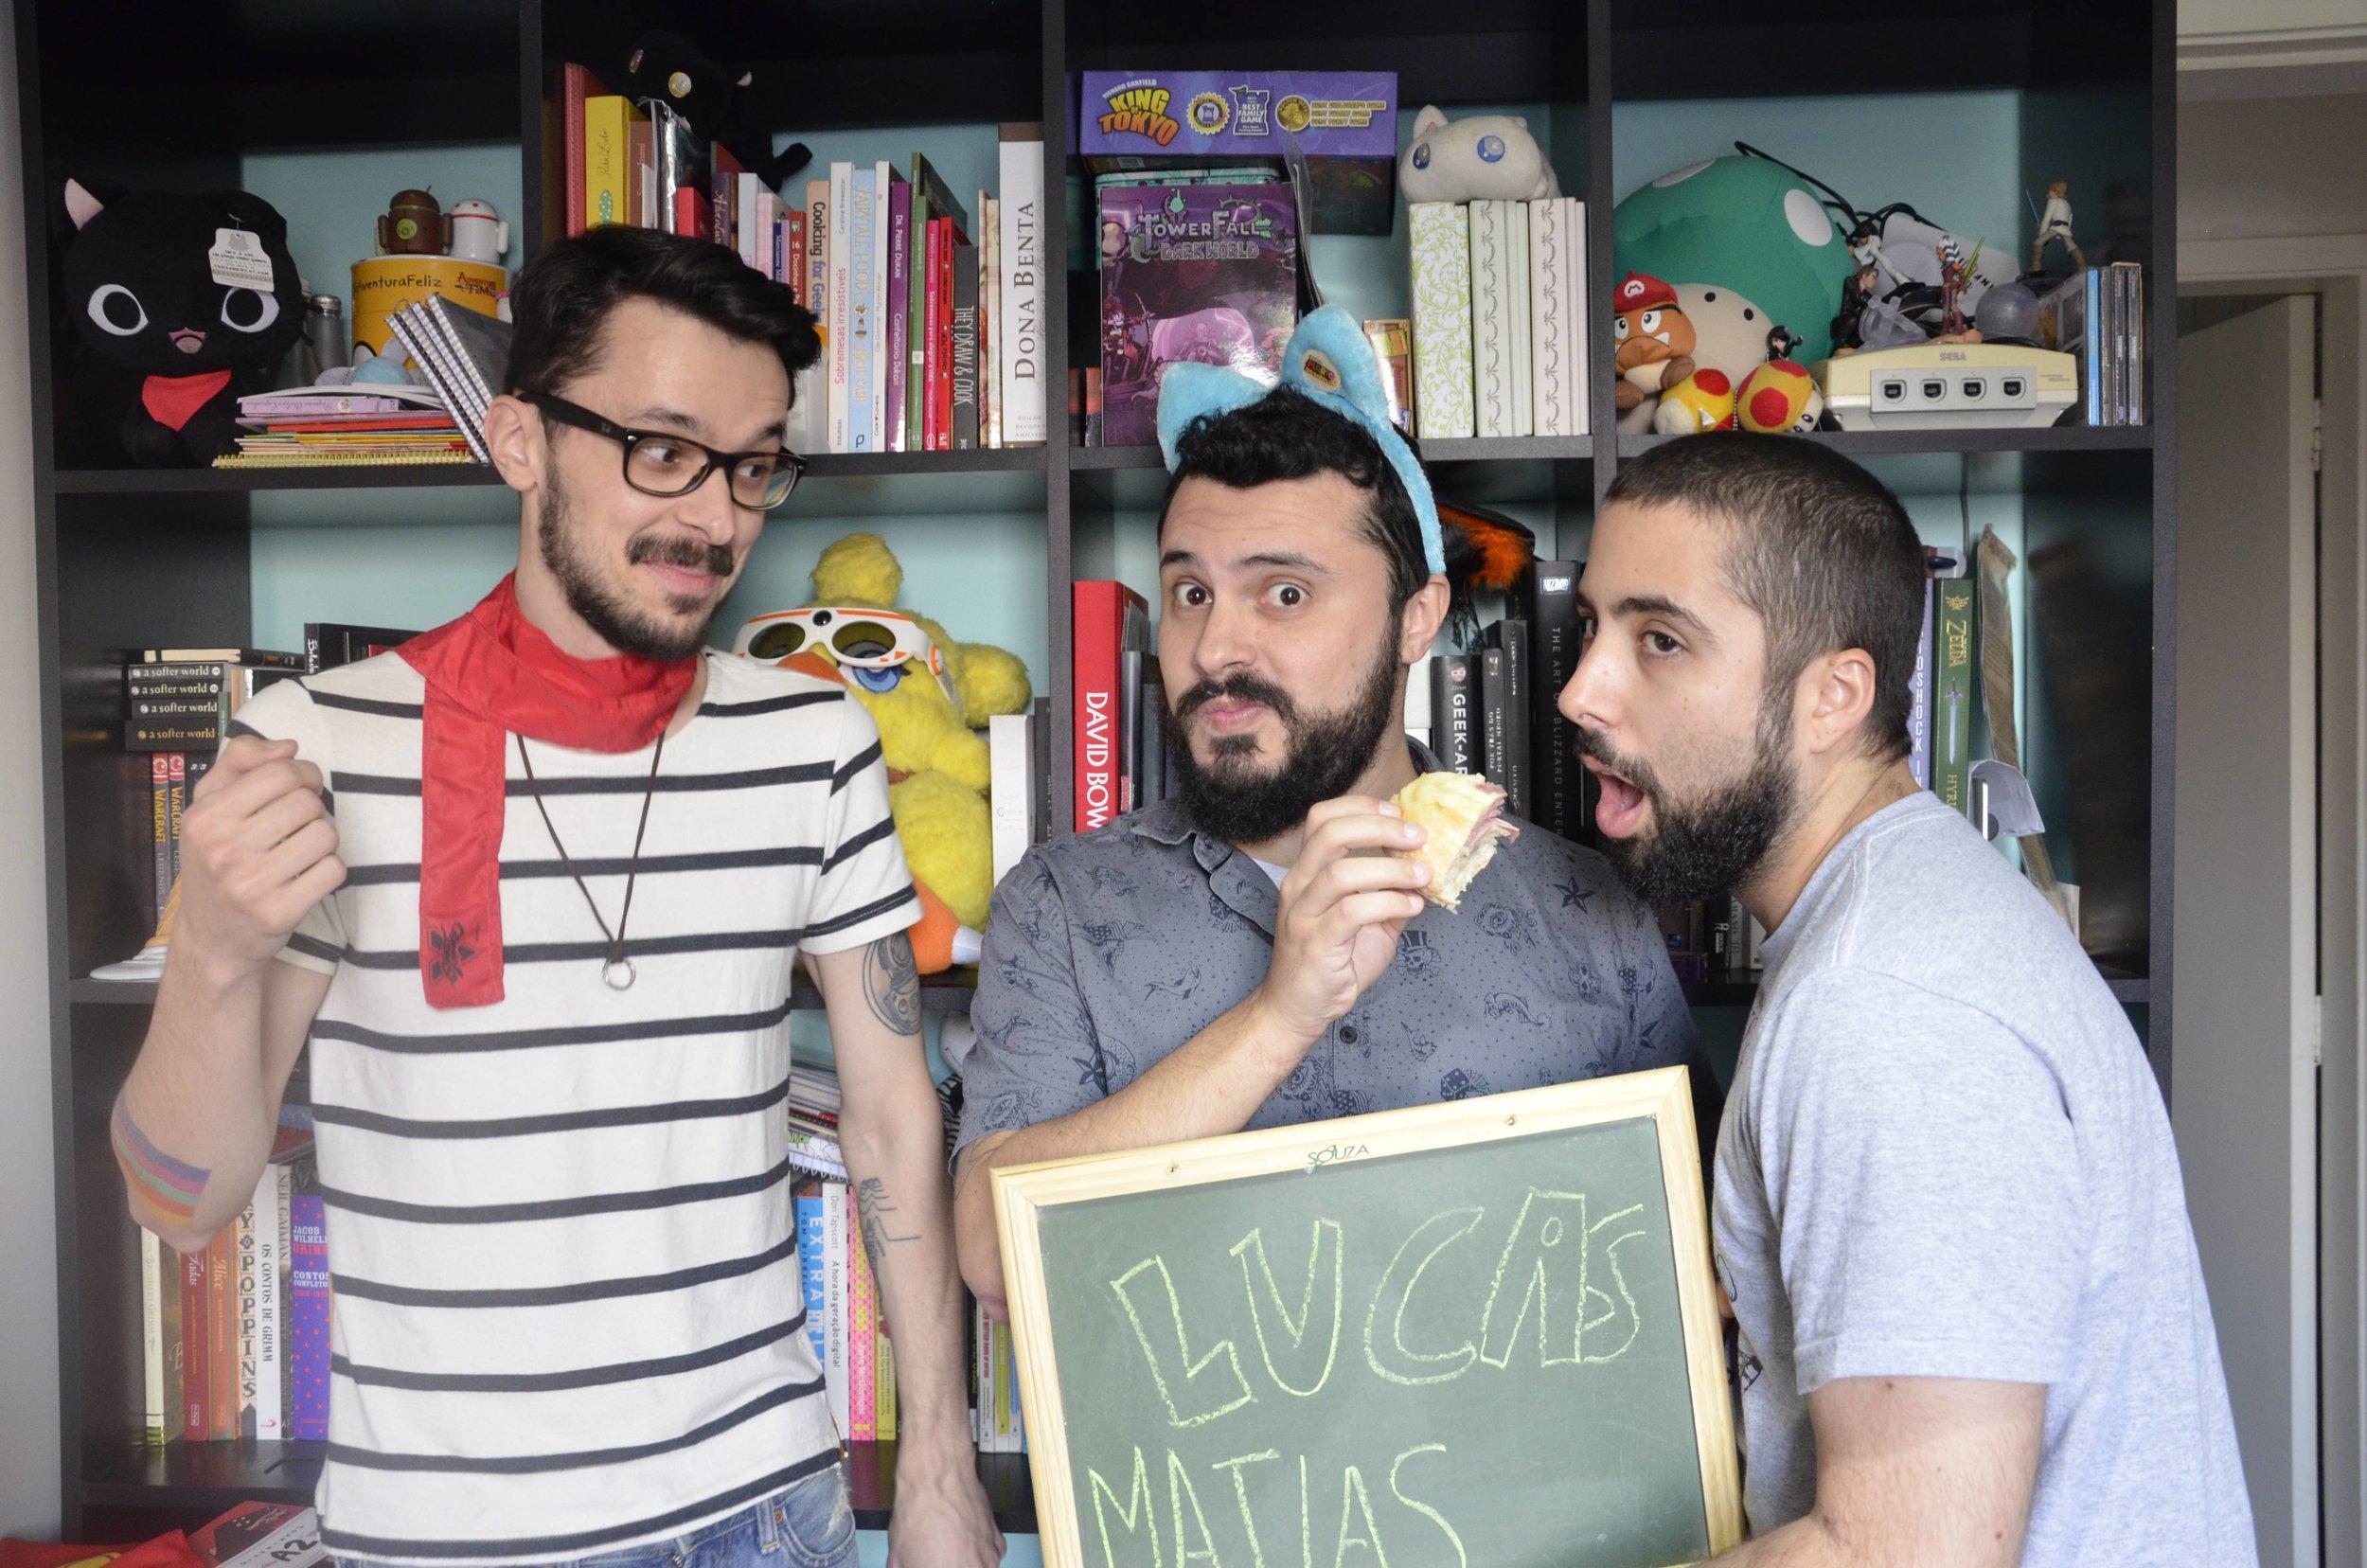 Lucas-Matias.jpg